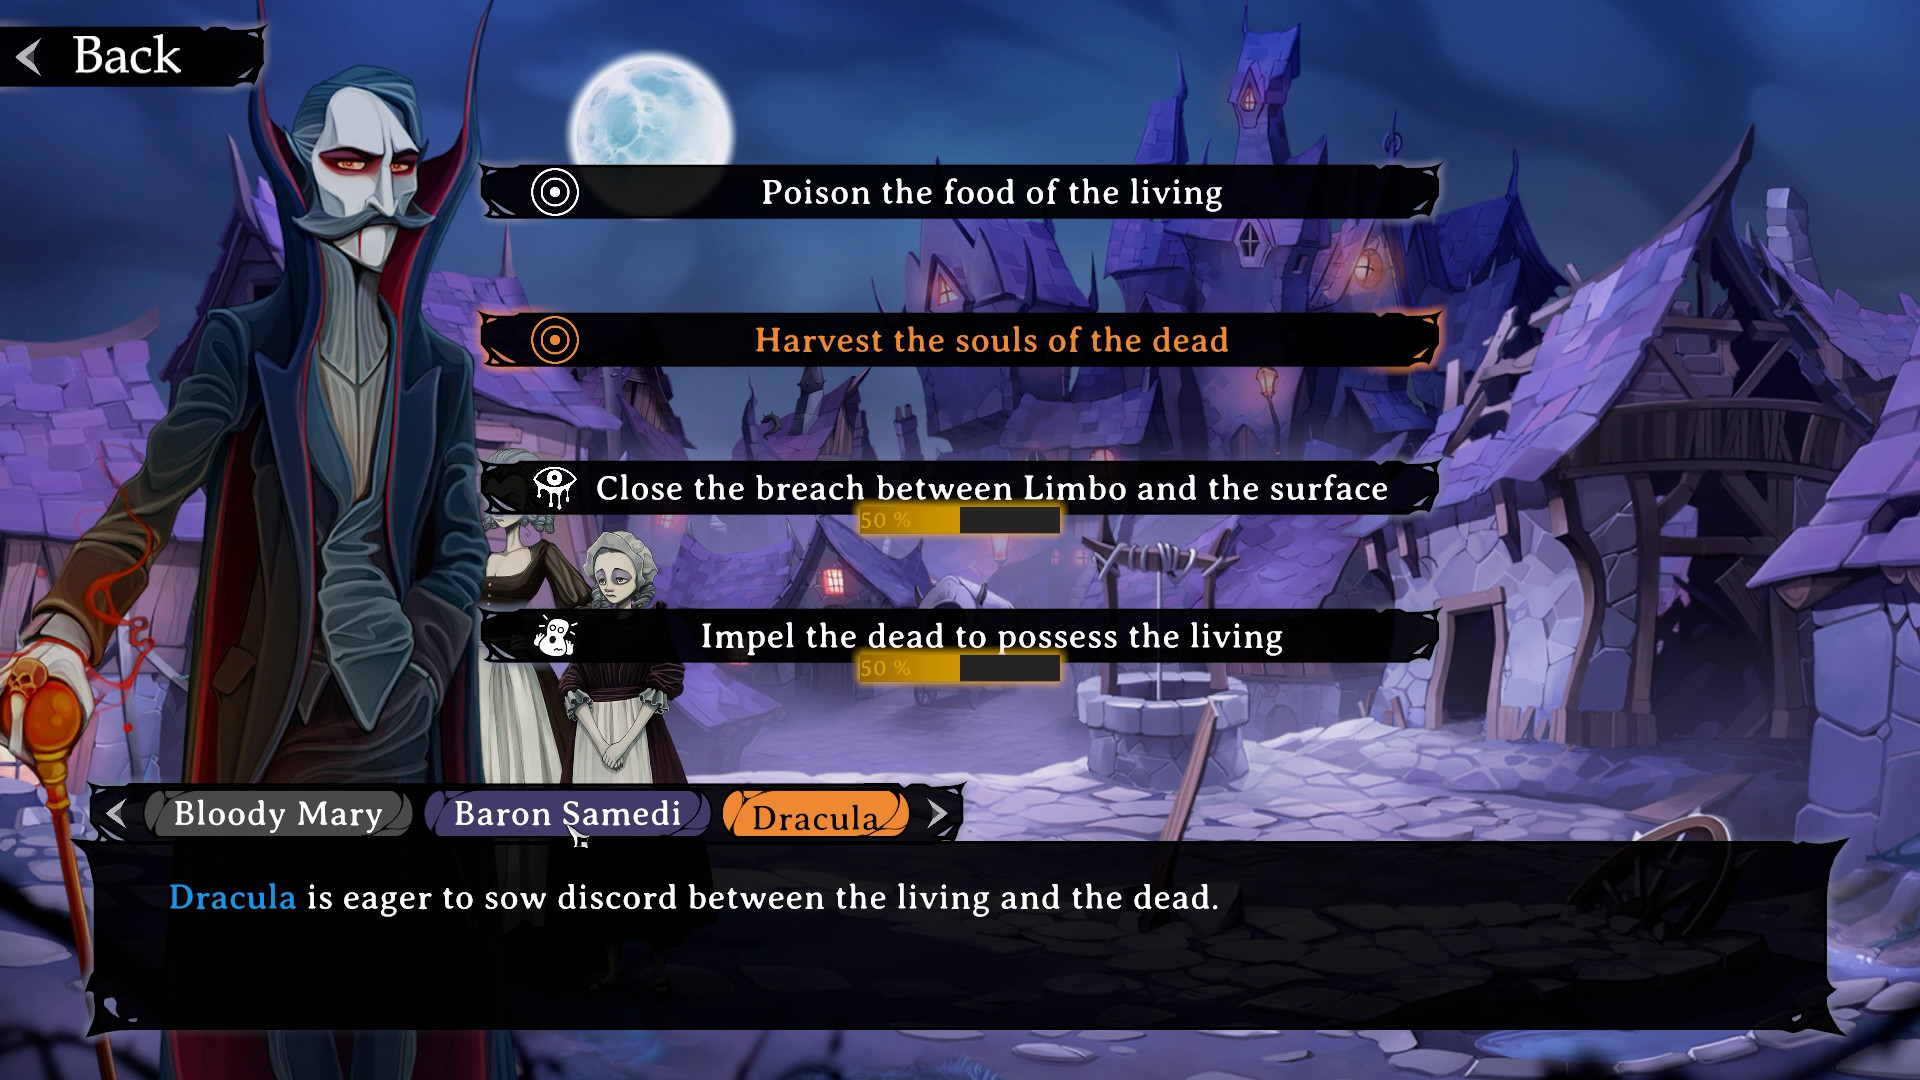 Roguelike游戏《暴戾领主》预告发布 2021年发售